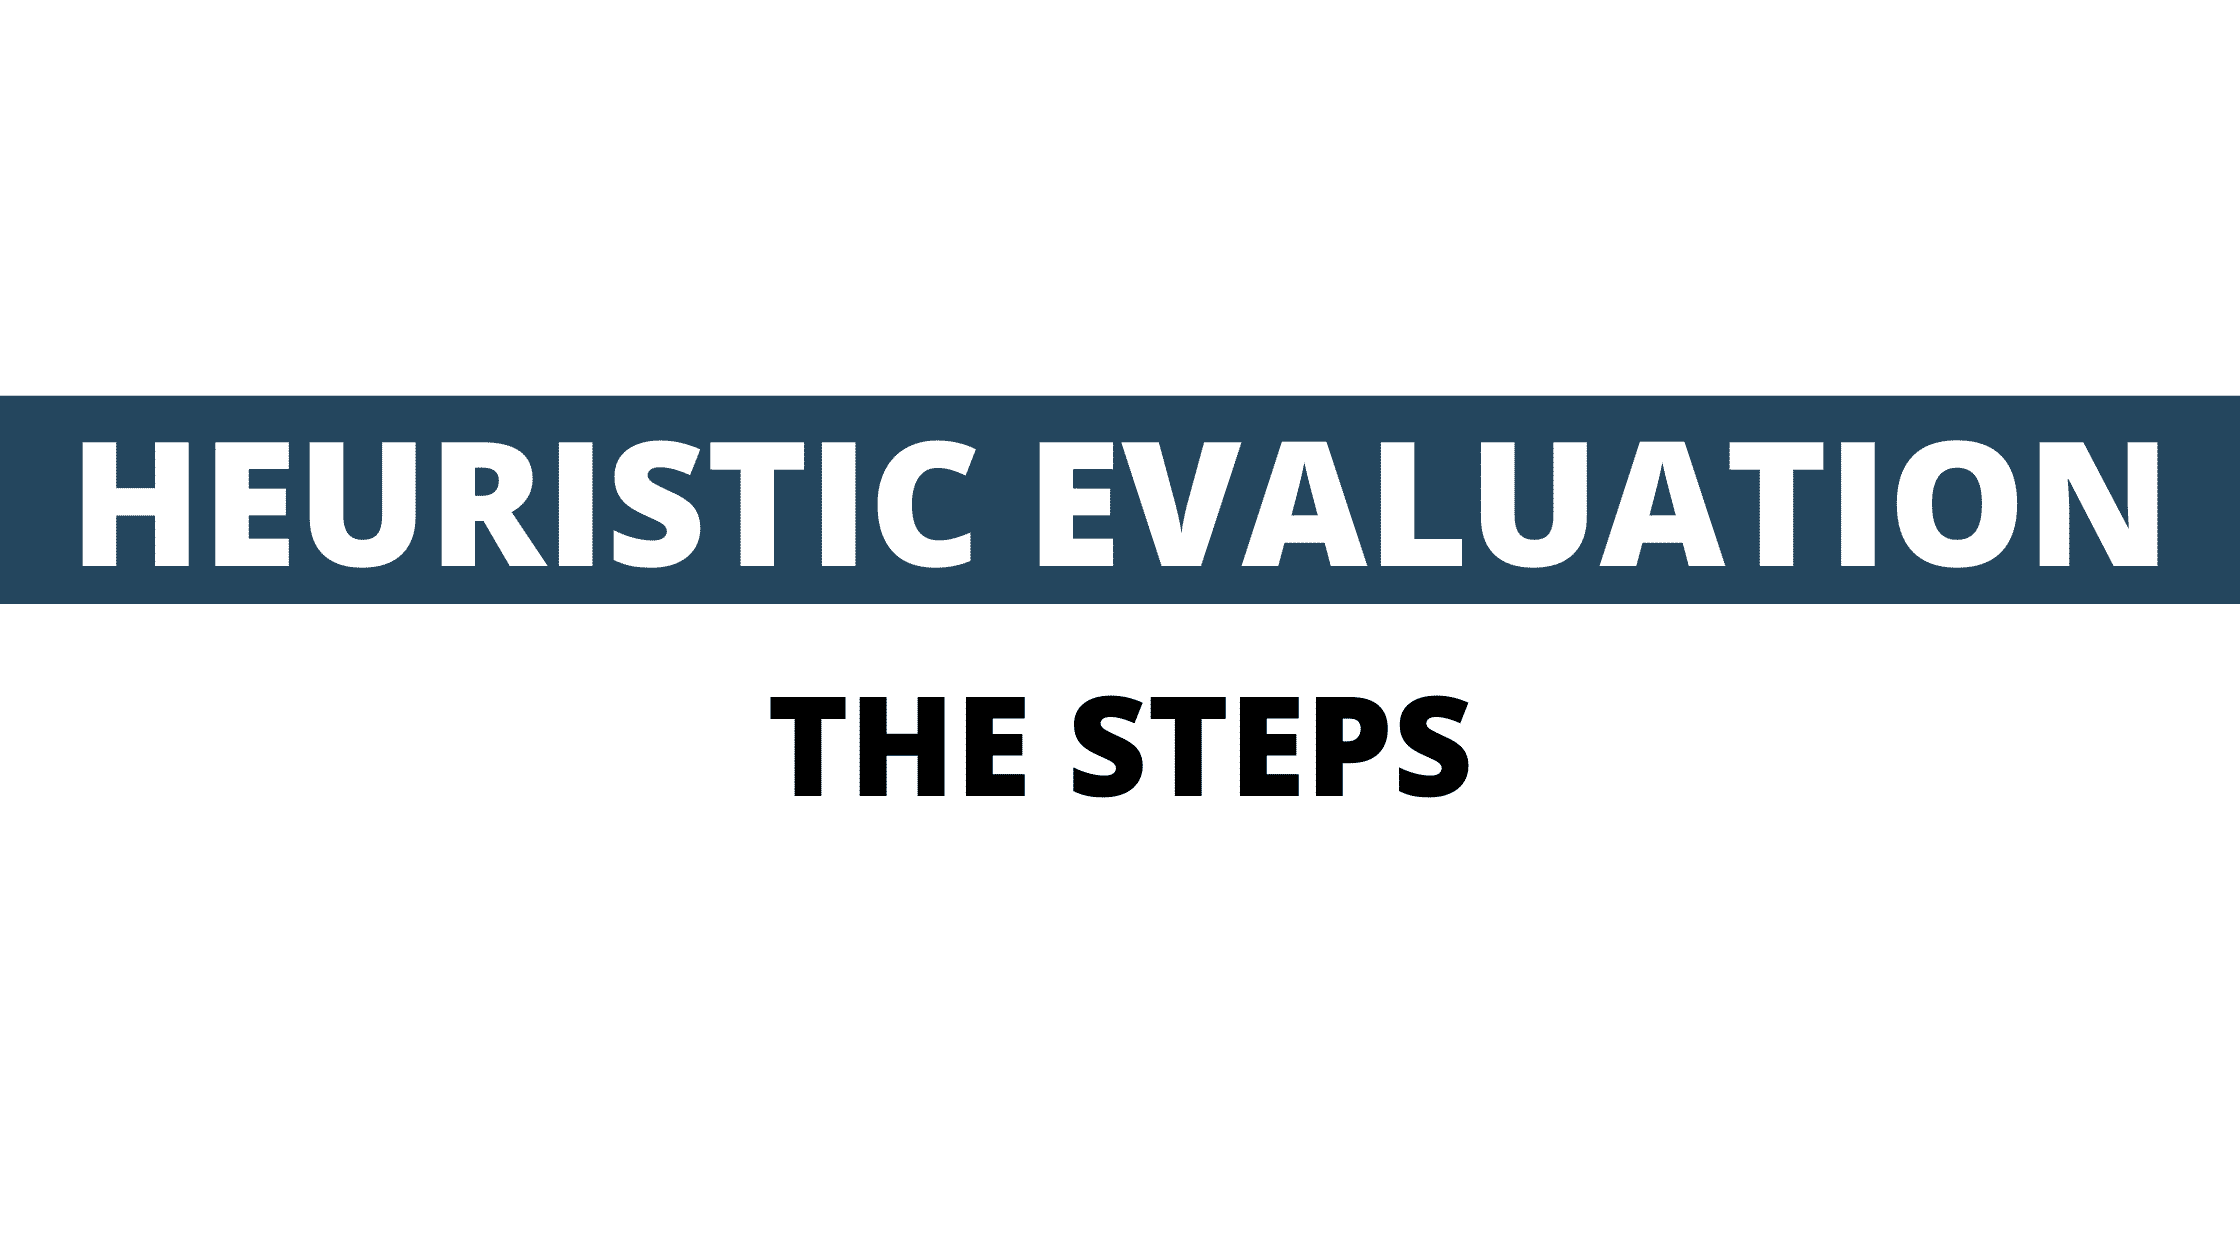 How to do a heuristic evaluation